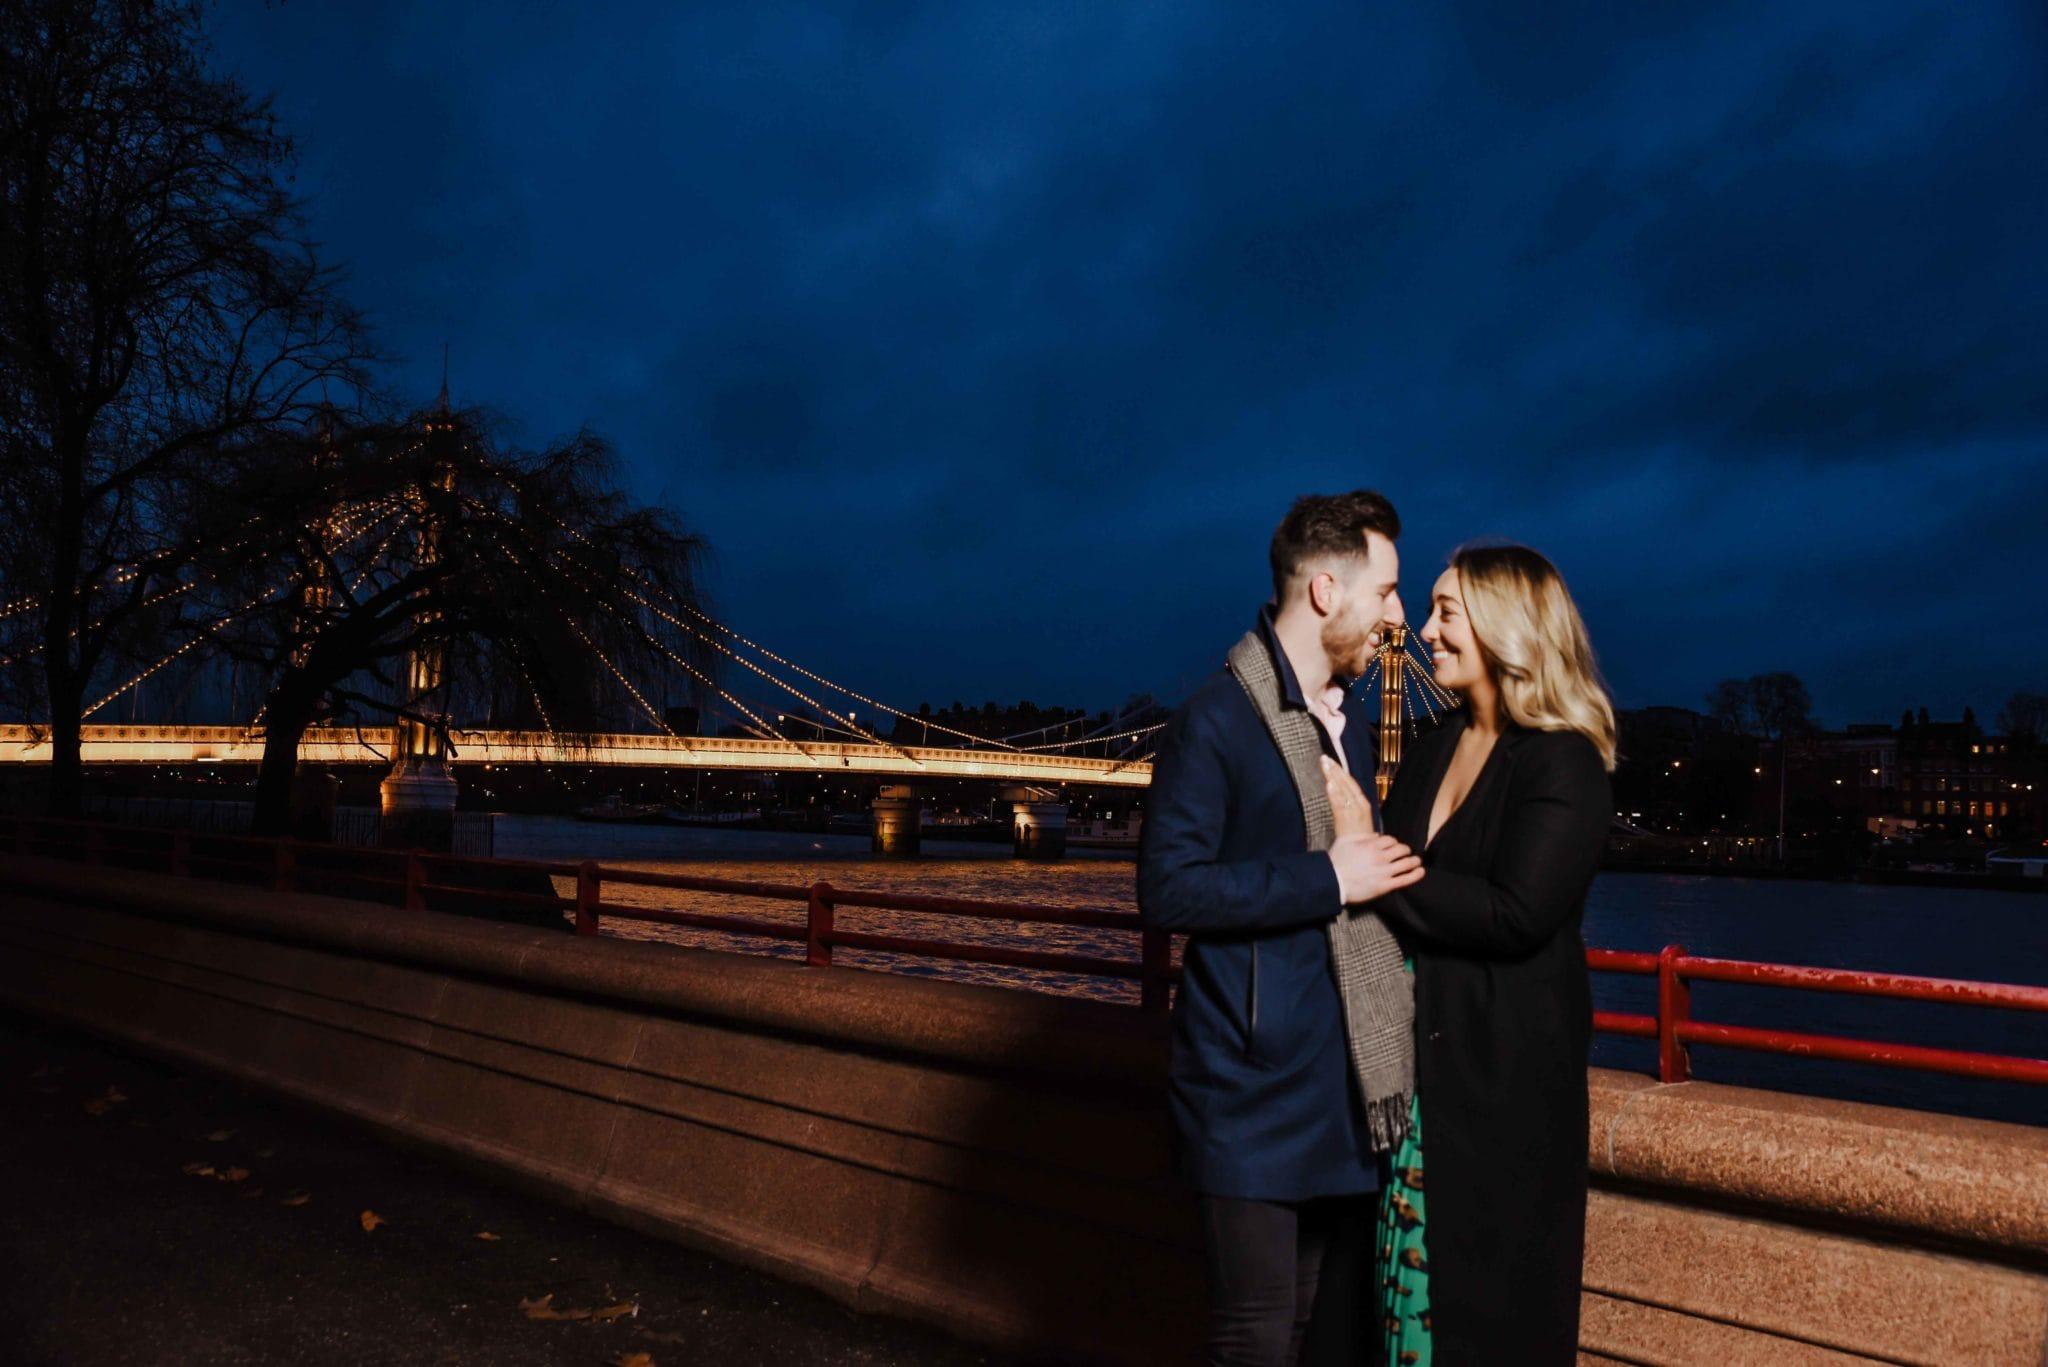 Man proposing to his girlfriend